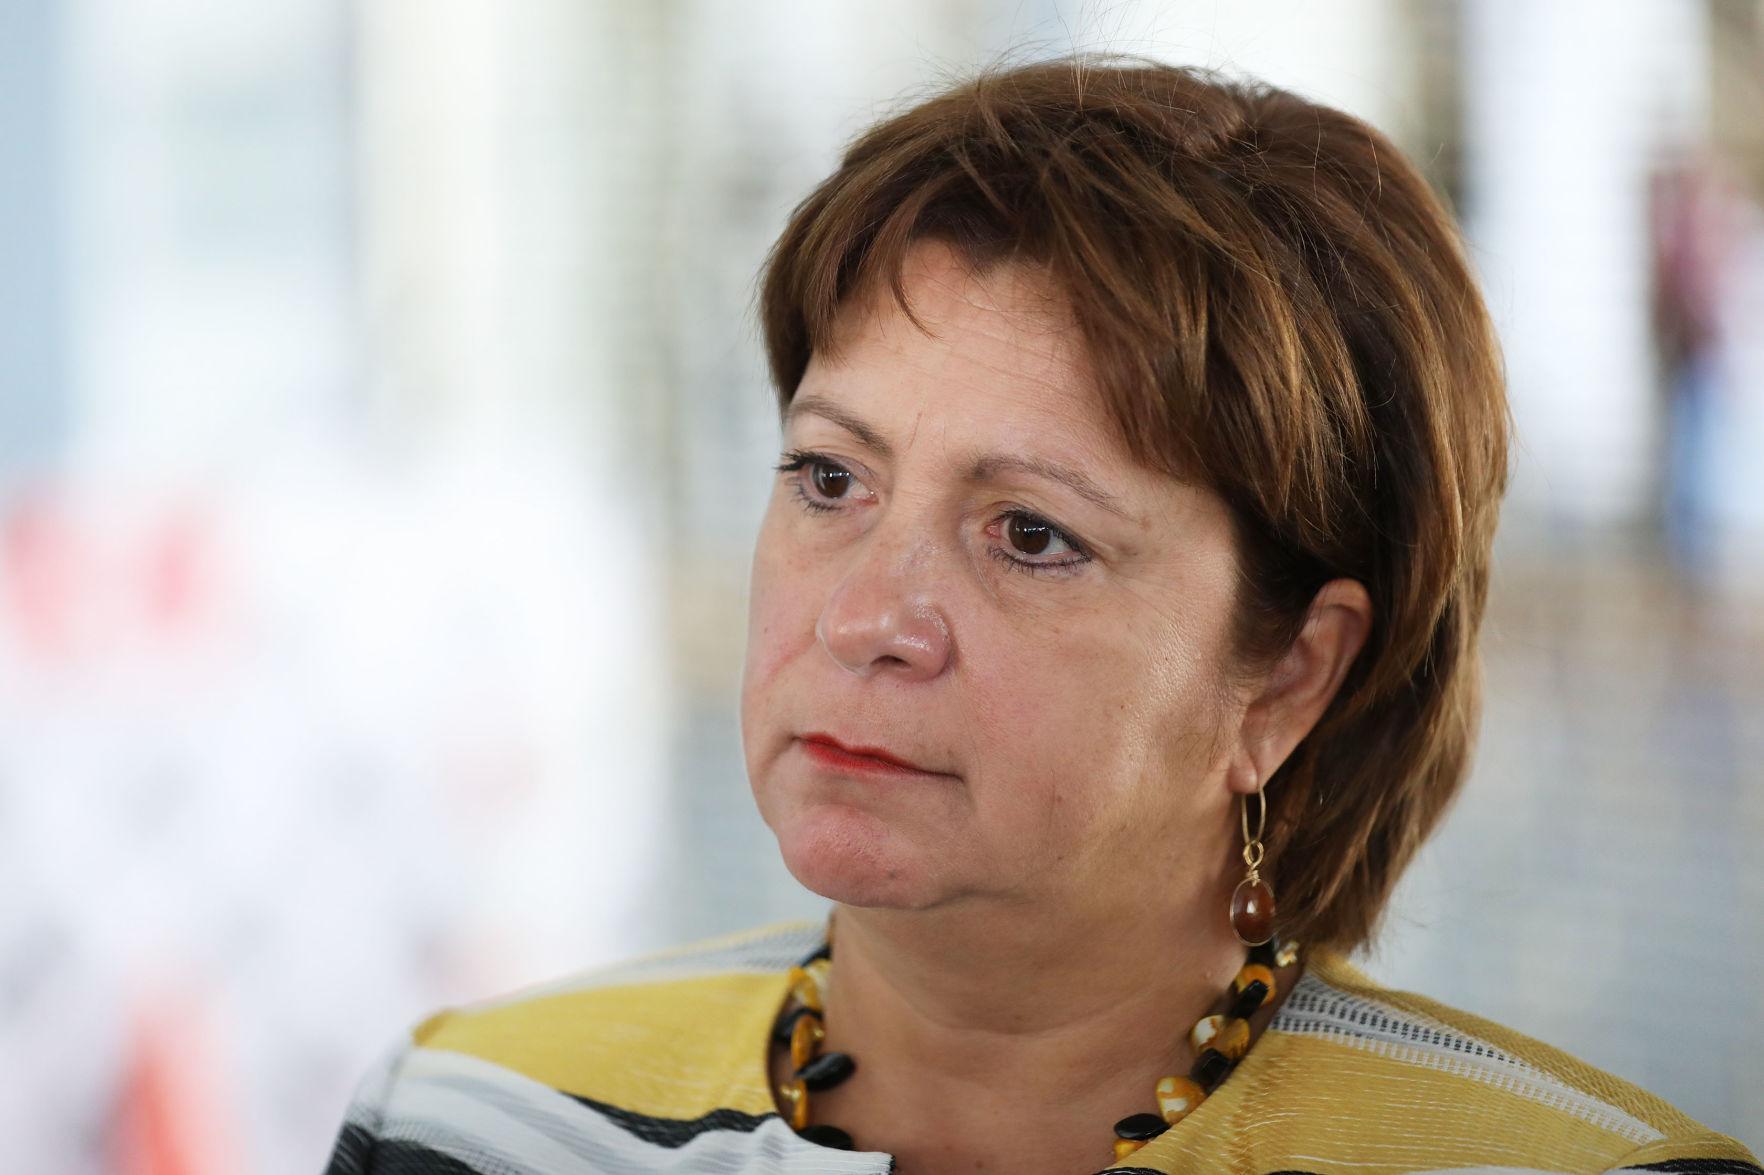 Natalie Jaresko